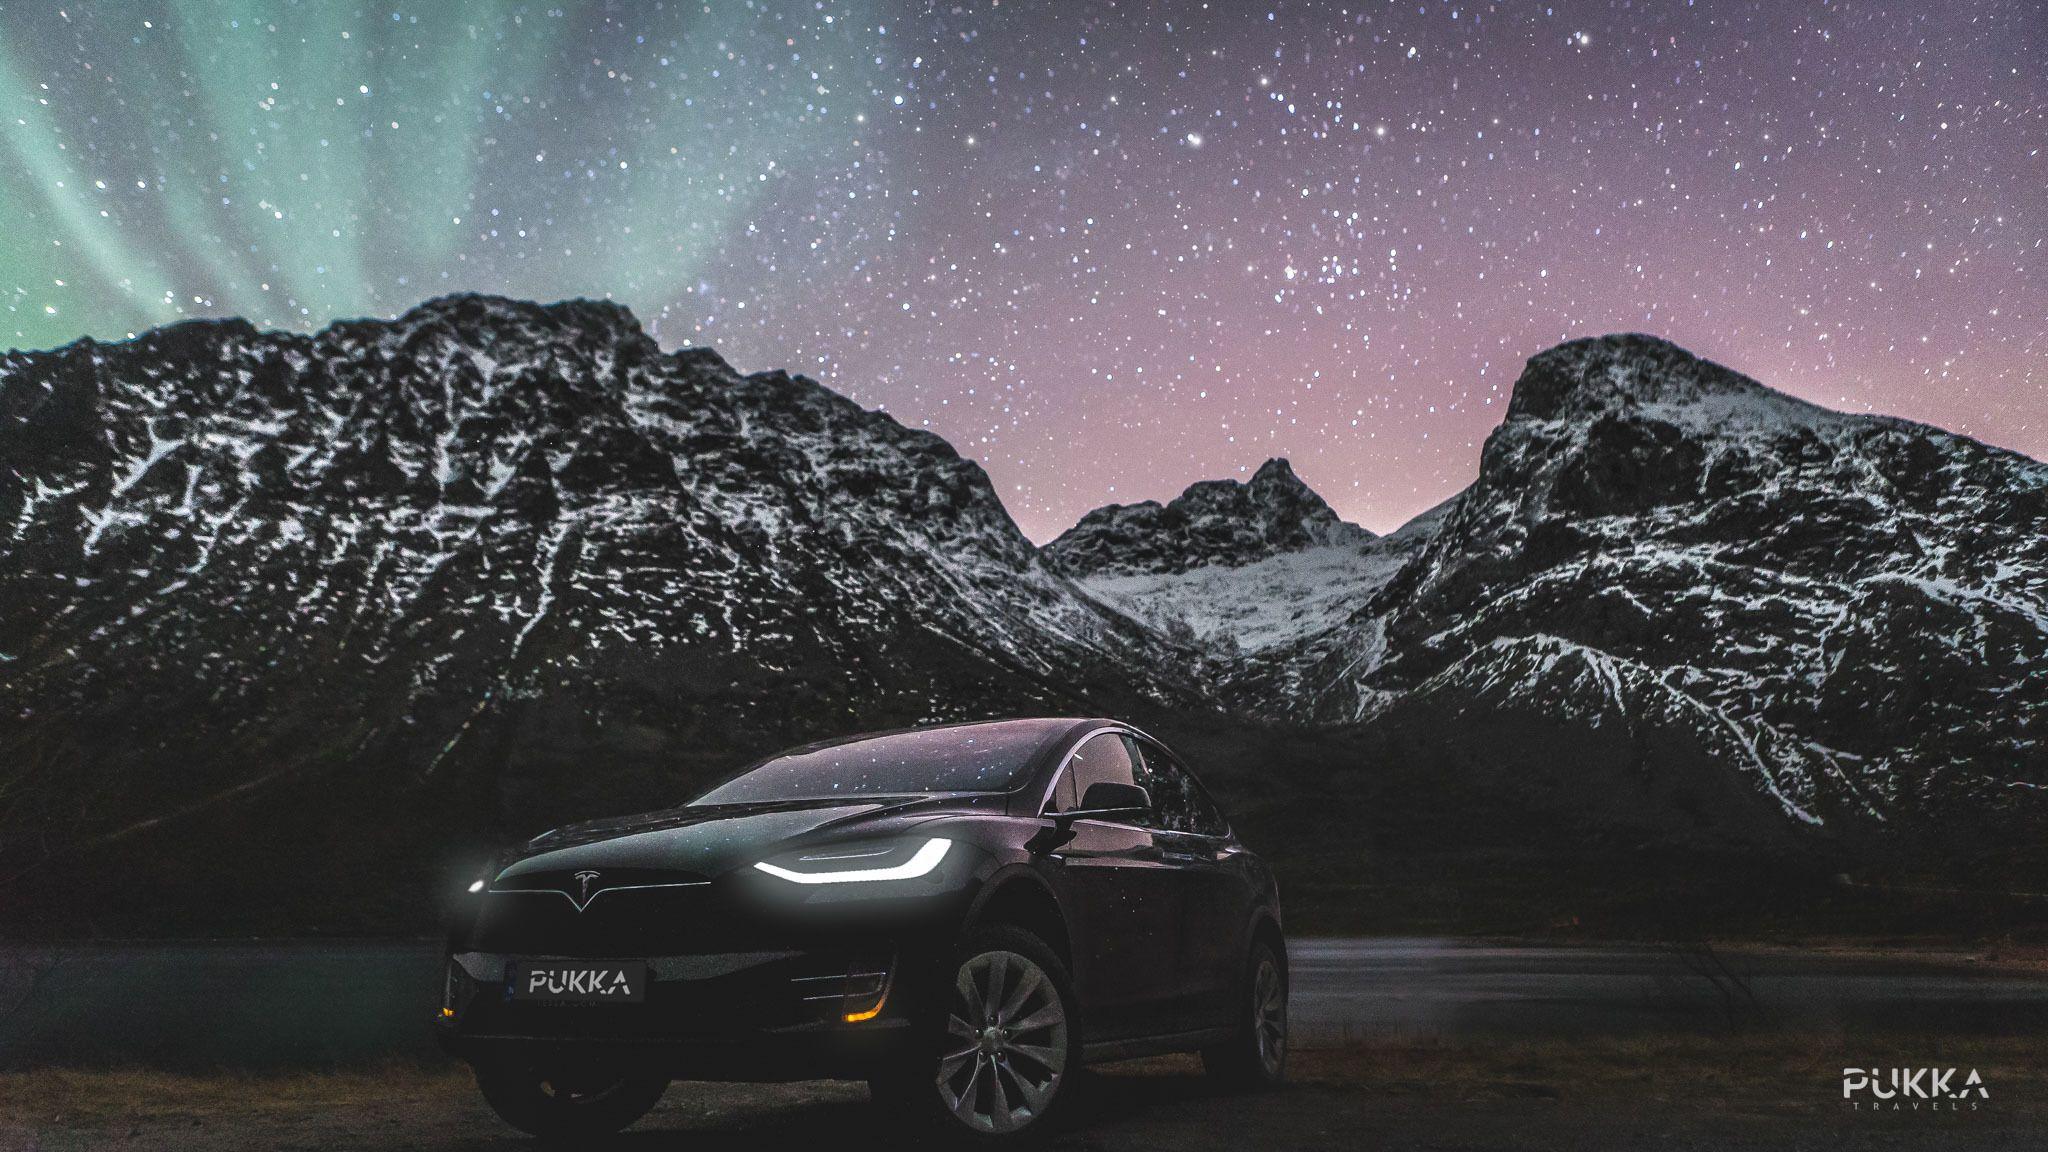 Aurora Borealis and a Tesla